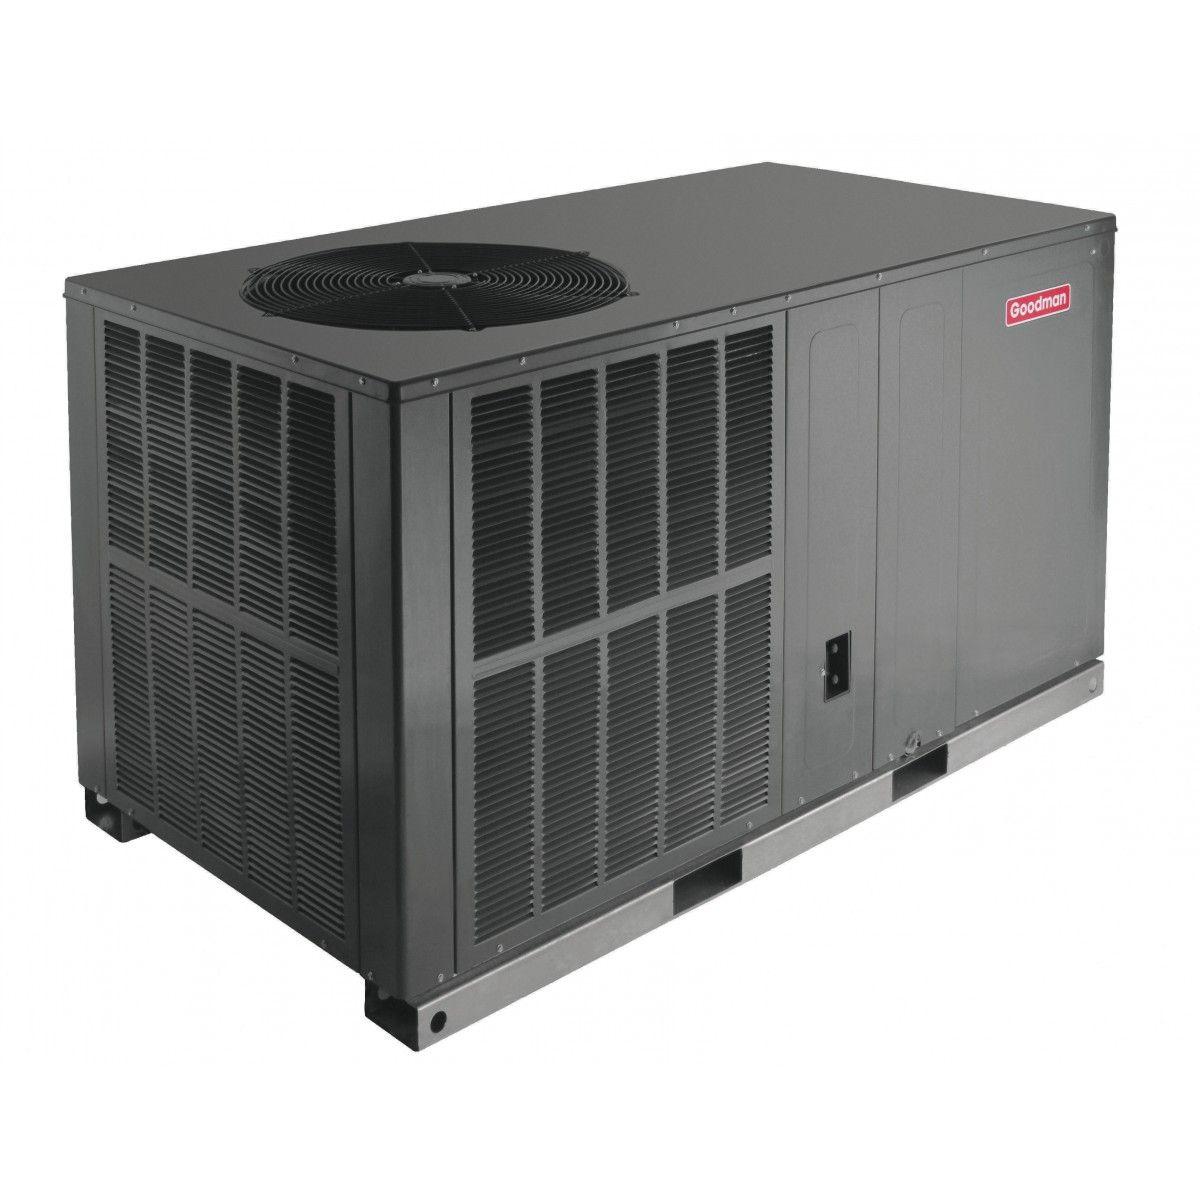 goodman 3.0 ton 14 seer electric heat package unit horizontal